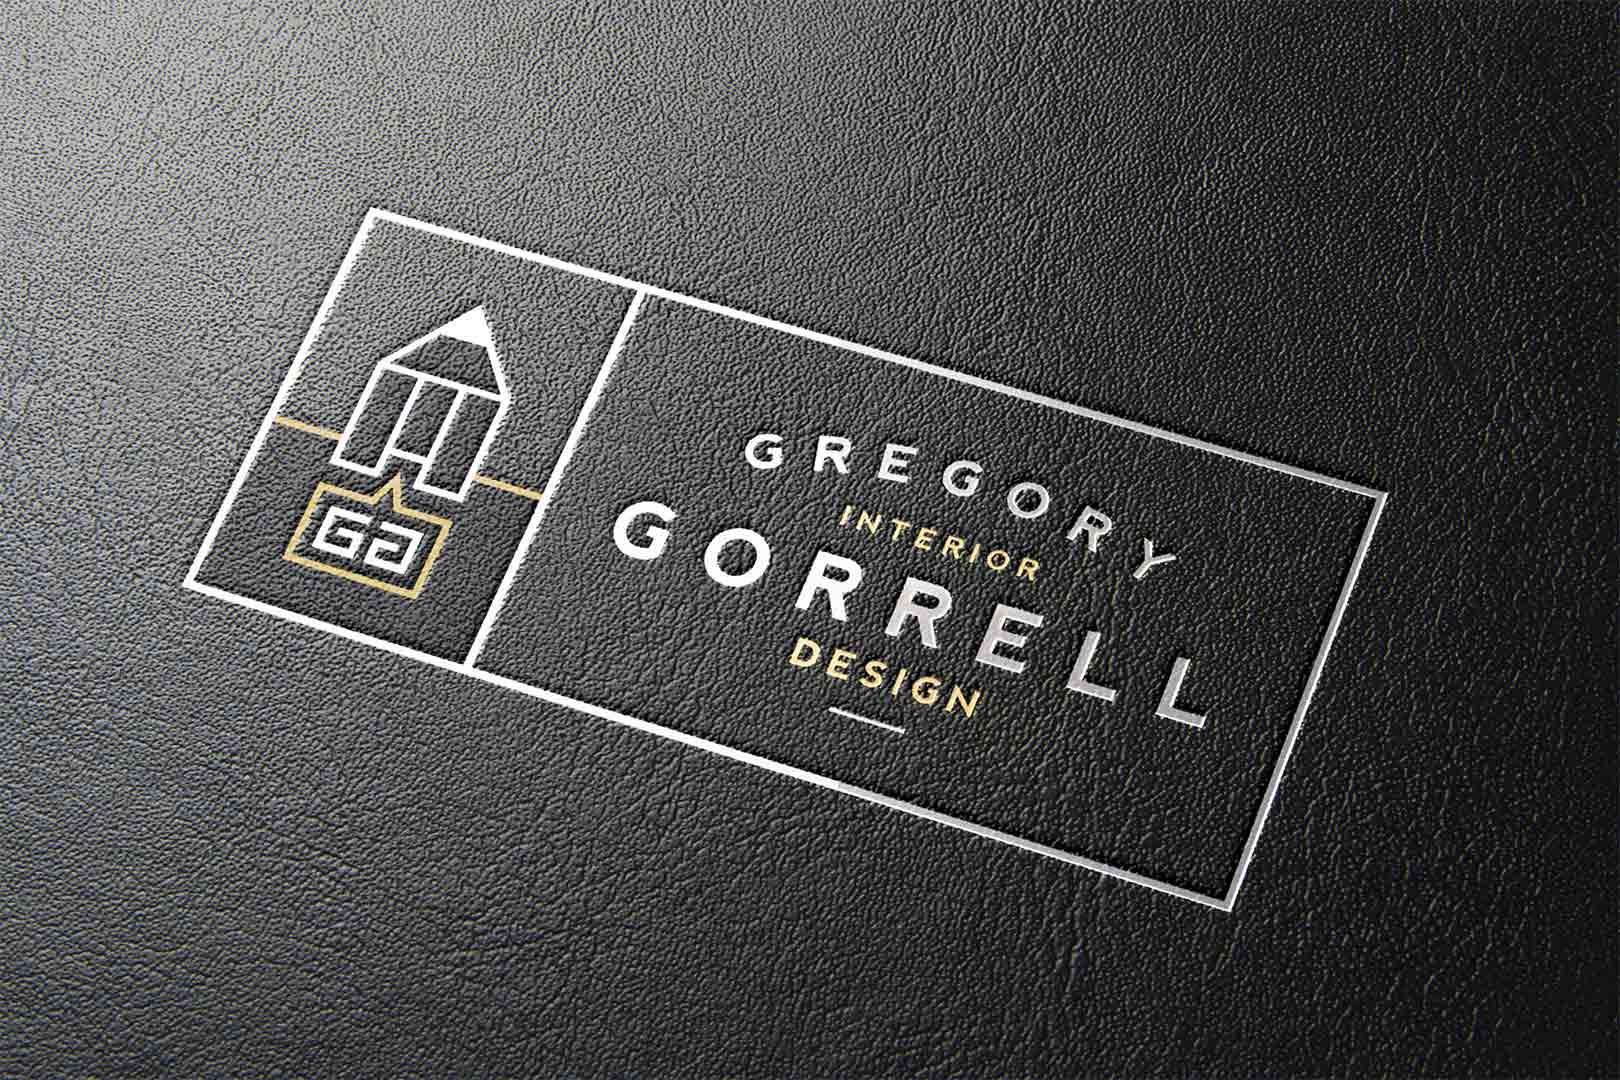 Gorrell Identity